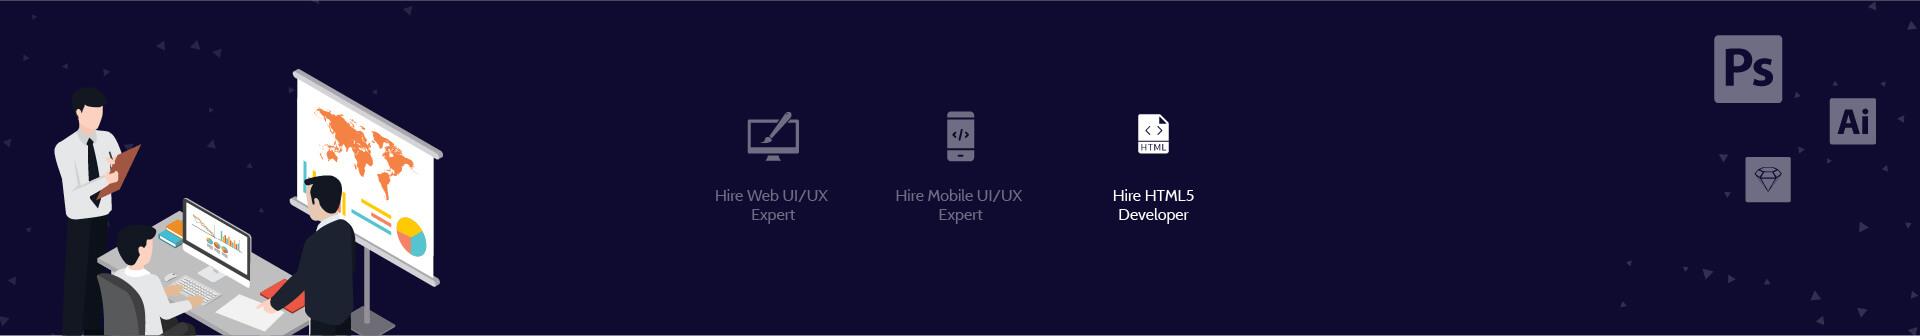 Hire HTML 5 Developer